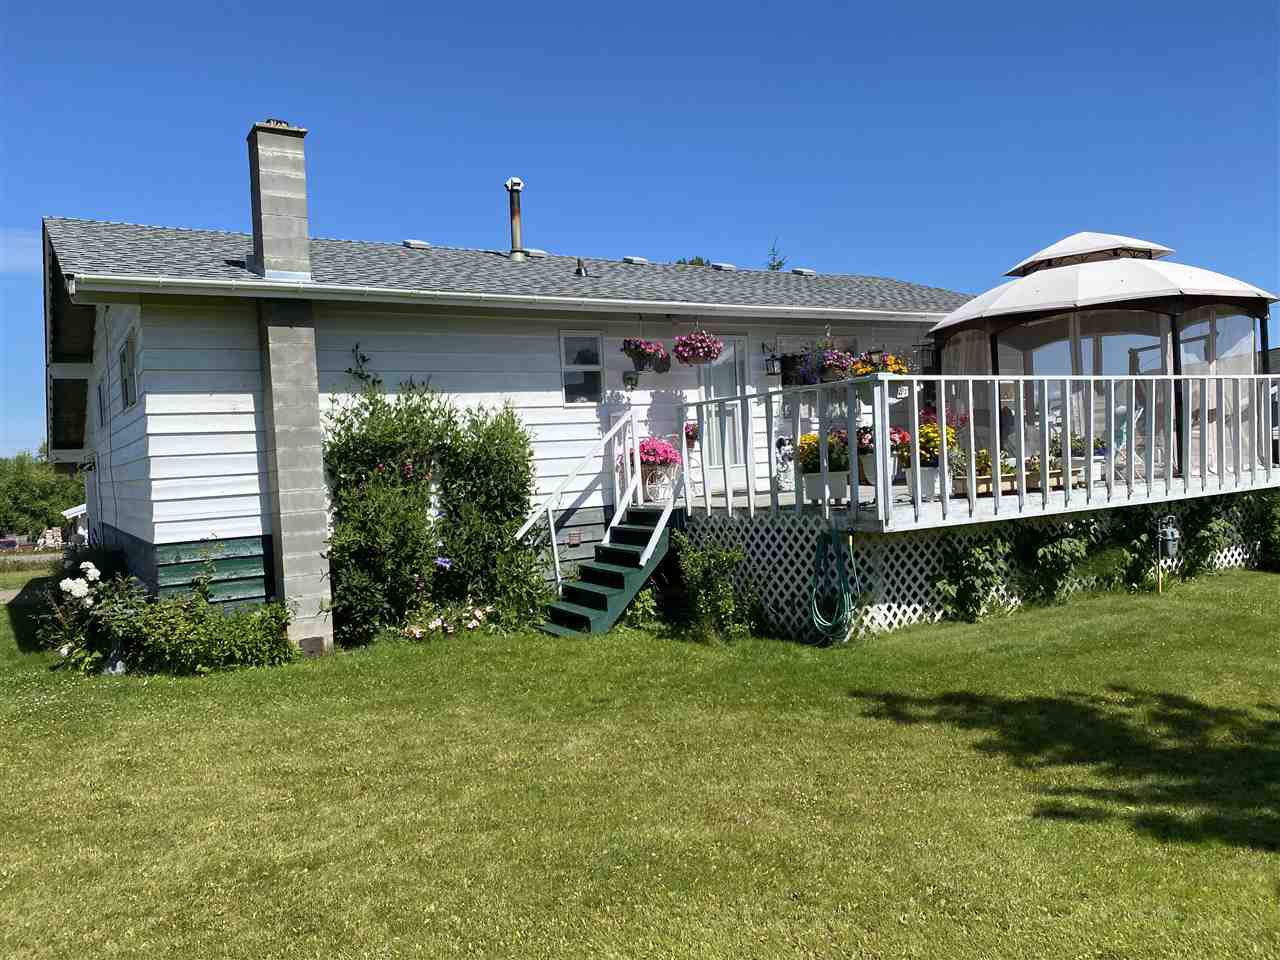 Main Photo: 15 STERRETT Avenue in Burns Lake: Granisle House for sale (Burns Lake (Zone 55))  : MLS®# R2481581